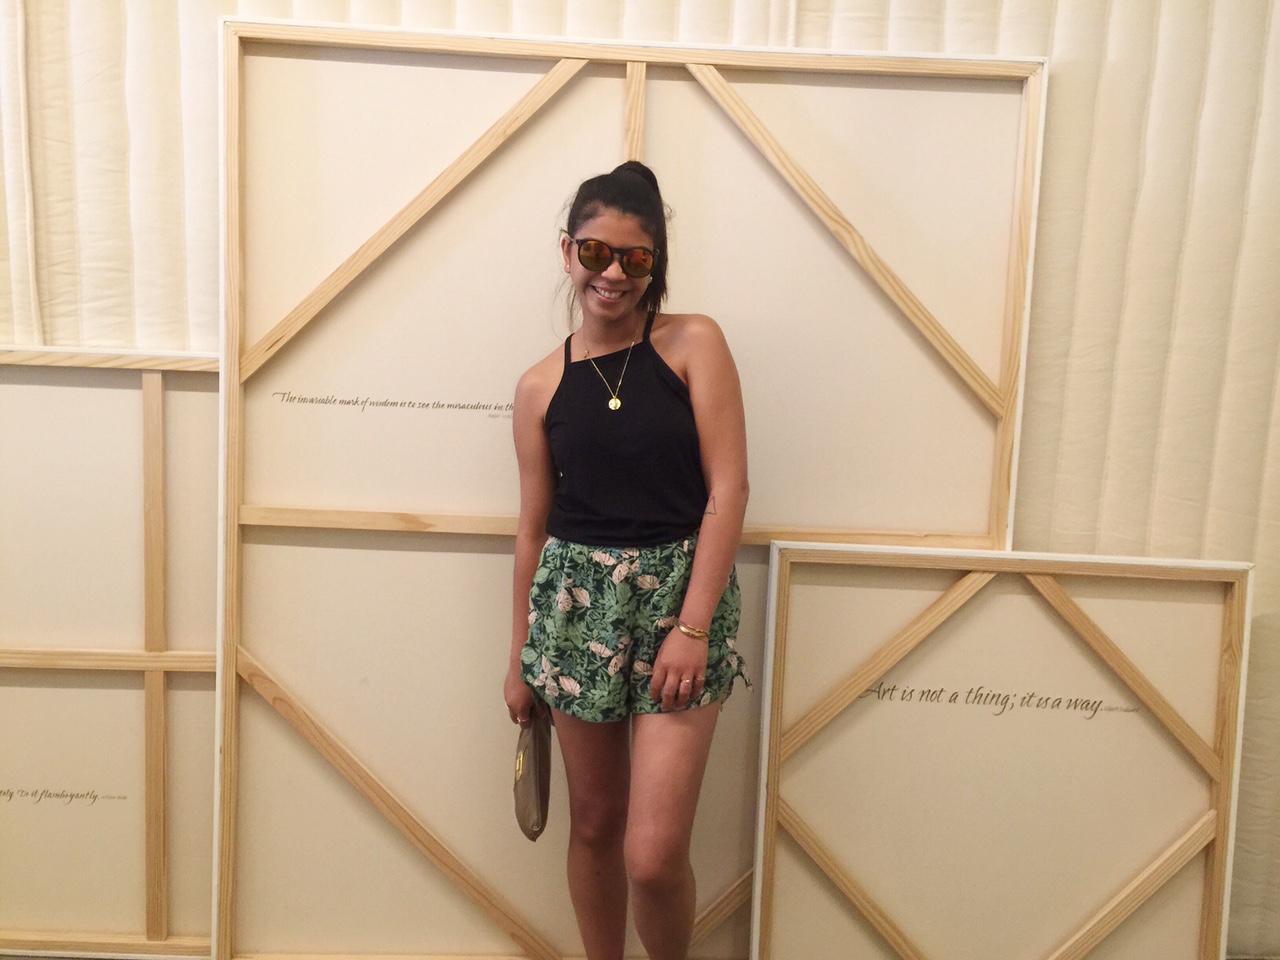 fashion blogger, ootd, tropical print shorts, black tank top, leopard print sandals, summer, portland blogger, the p town girls, thirty bucks, what i wore, fblogger